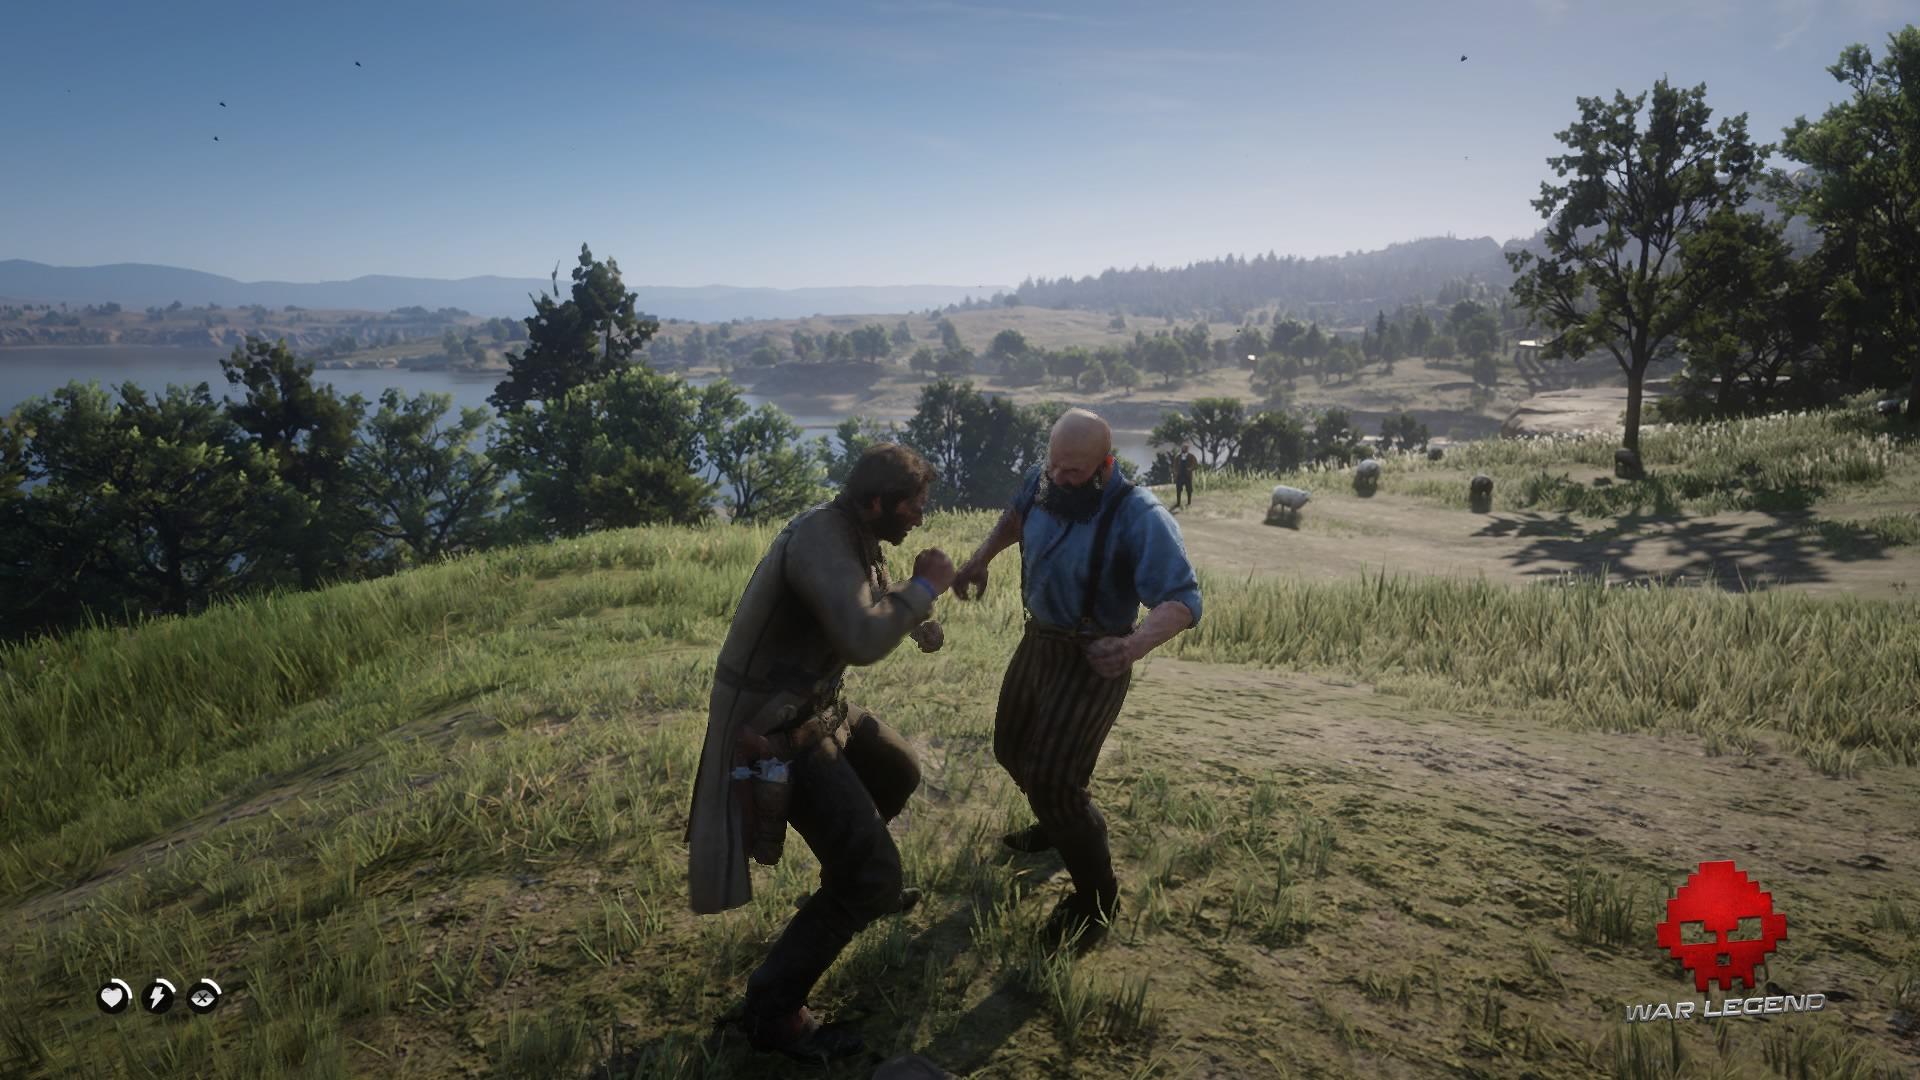 Une bagarre contre une brute